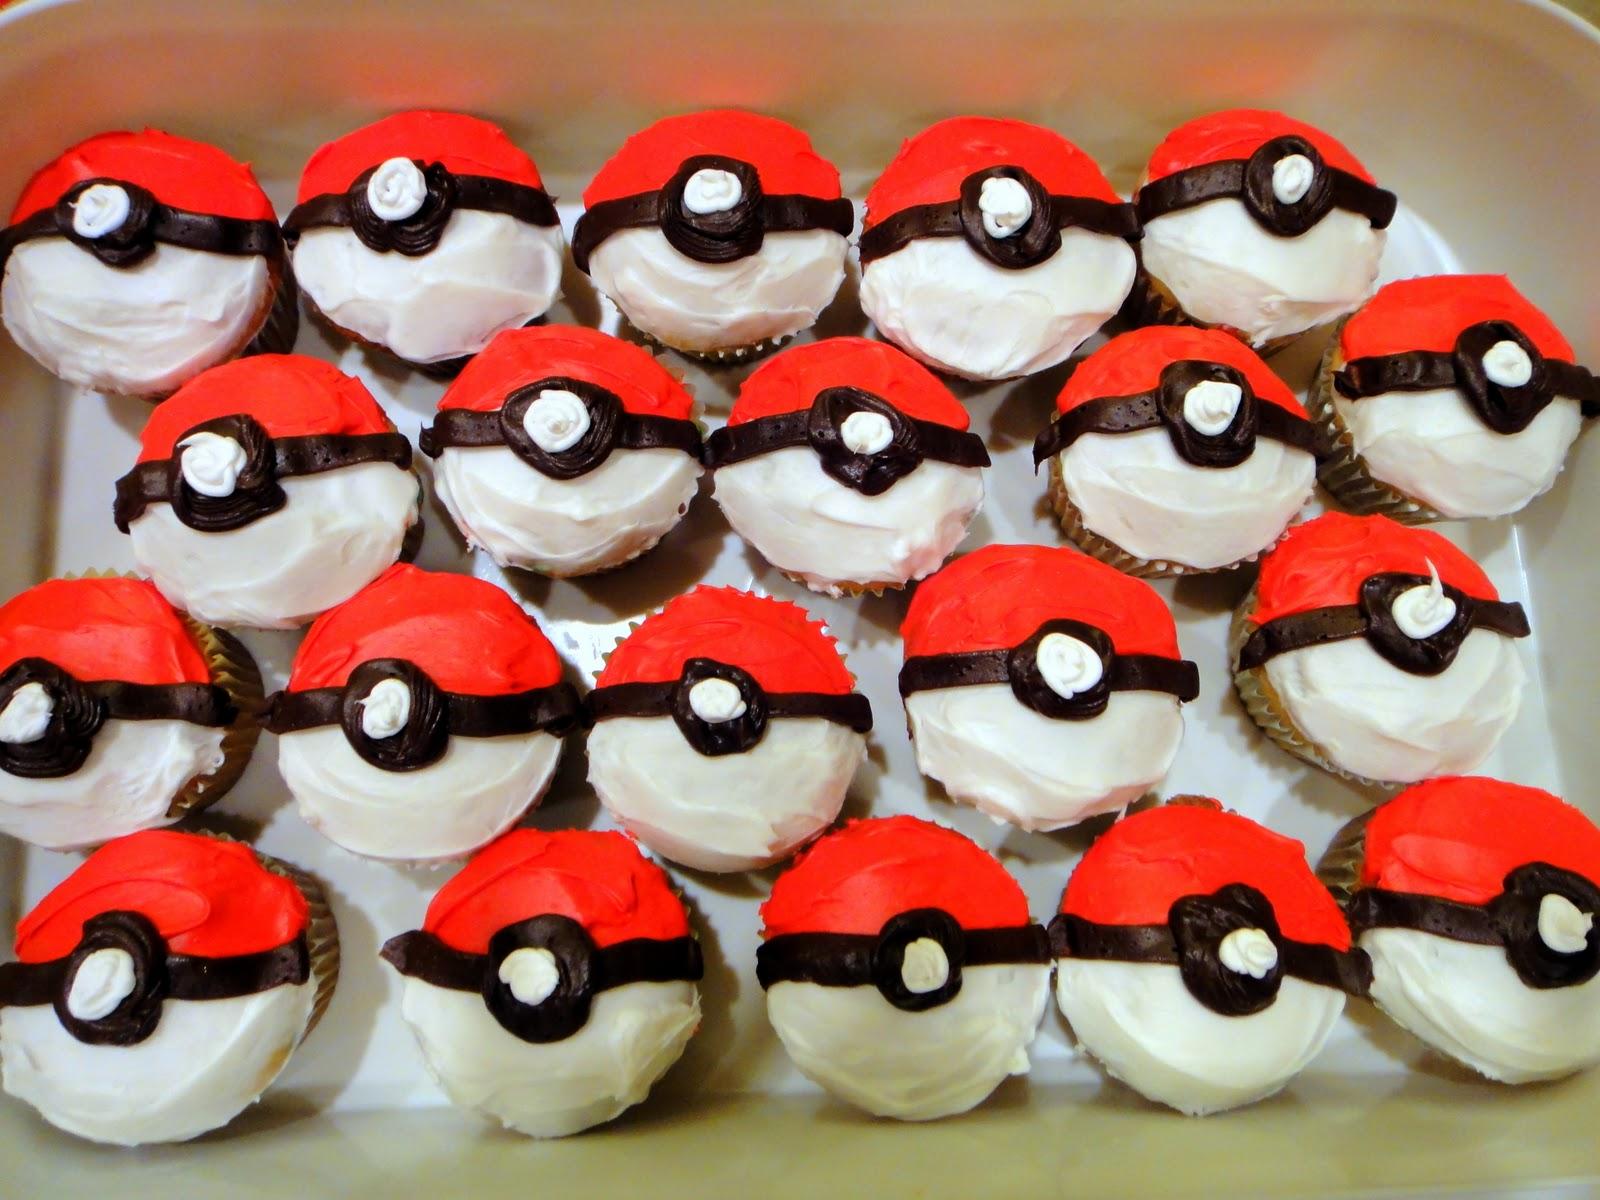 http://4.bp.blogspot.com/_ommirjIrwQs/TMScg6jjt0I/AAAAAAAAAoE/KLKXFVk7NRM/s1600/pokeball%25252Bcupcakes.jpg